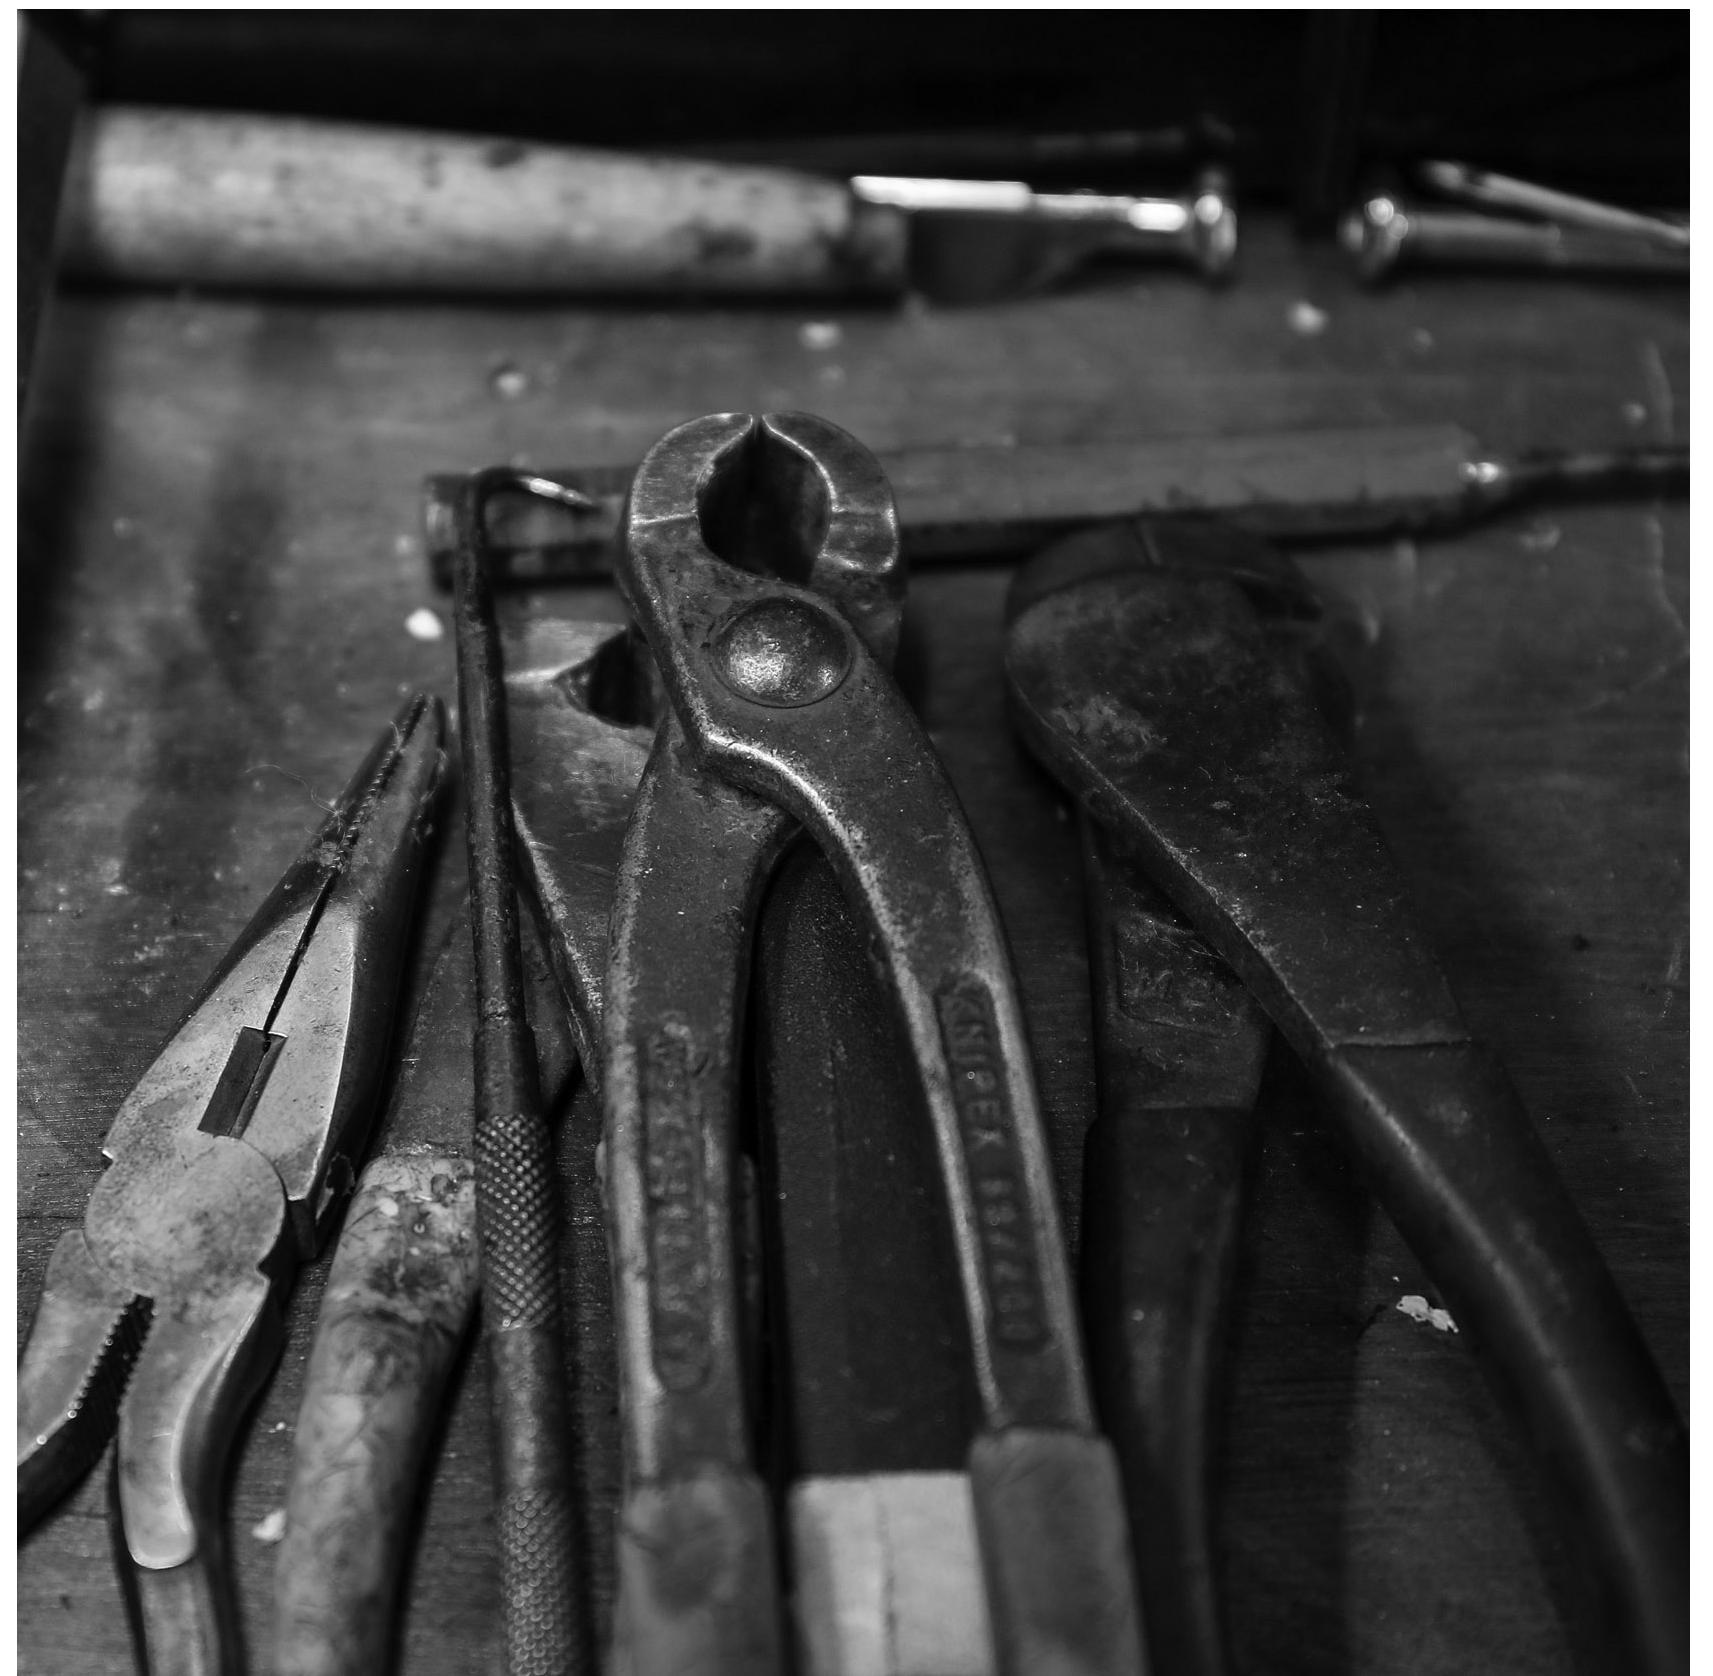 Gemmells-tools-round.png